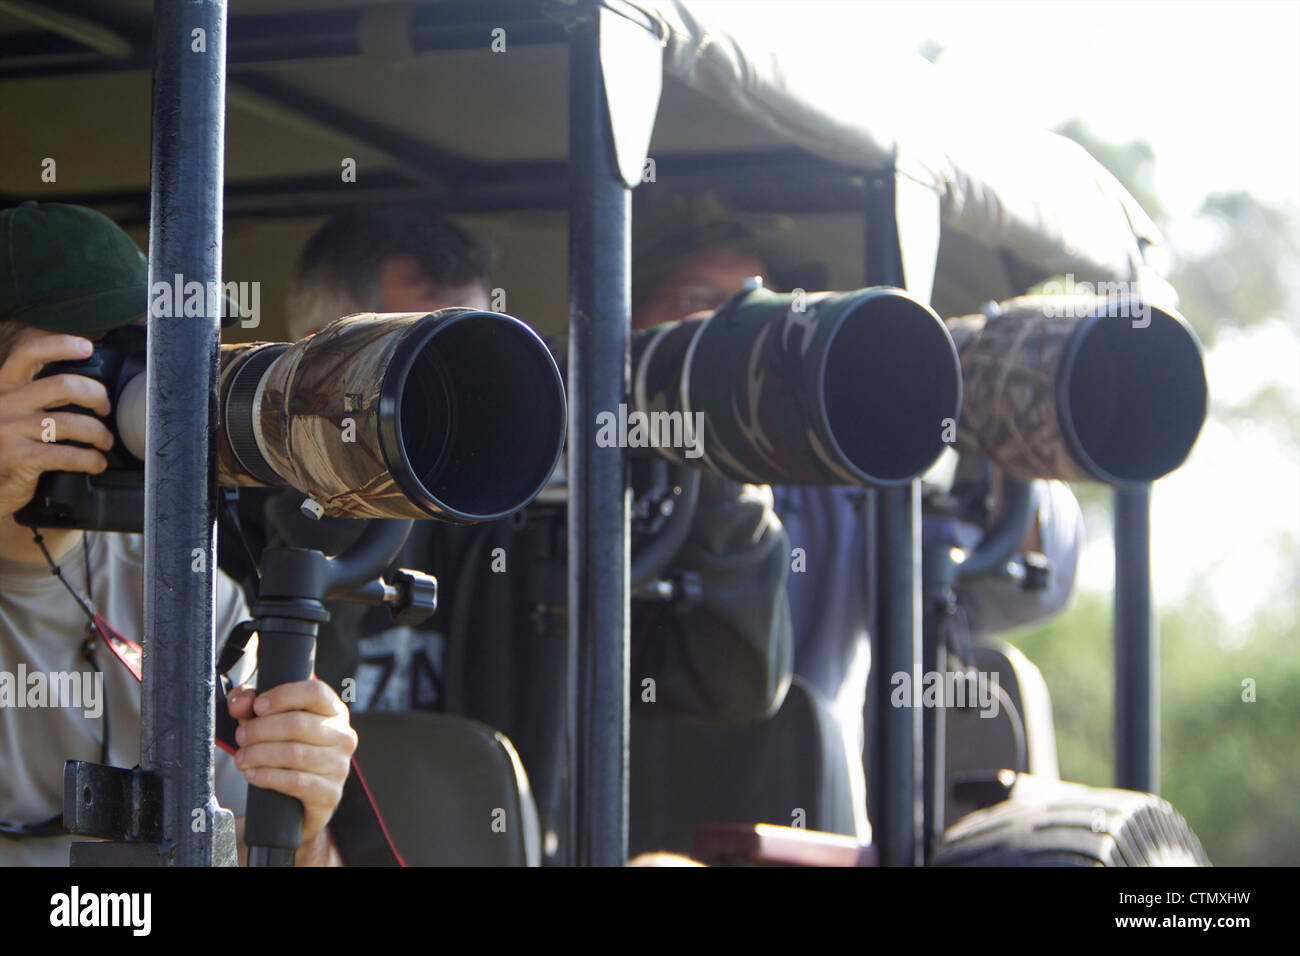 Photographers using large lenses while on safari, Okavango Delta, Botswana Stock Photo